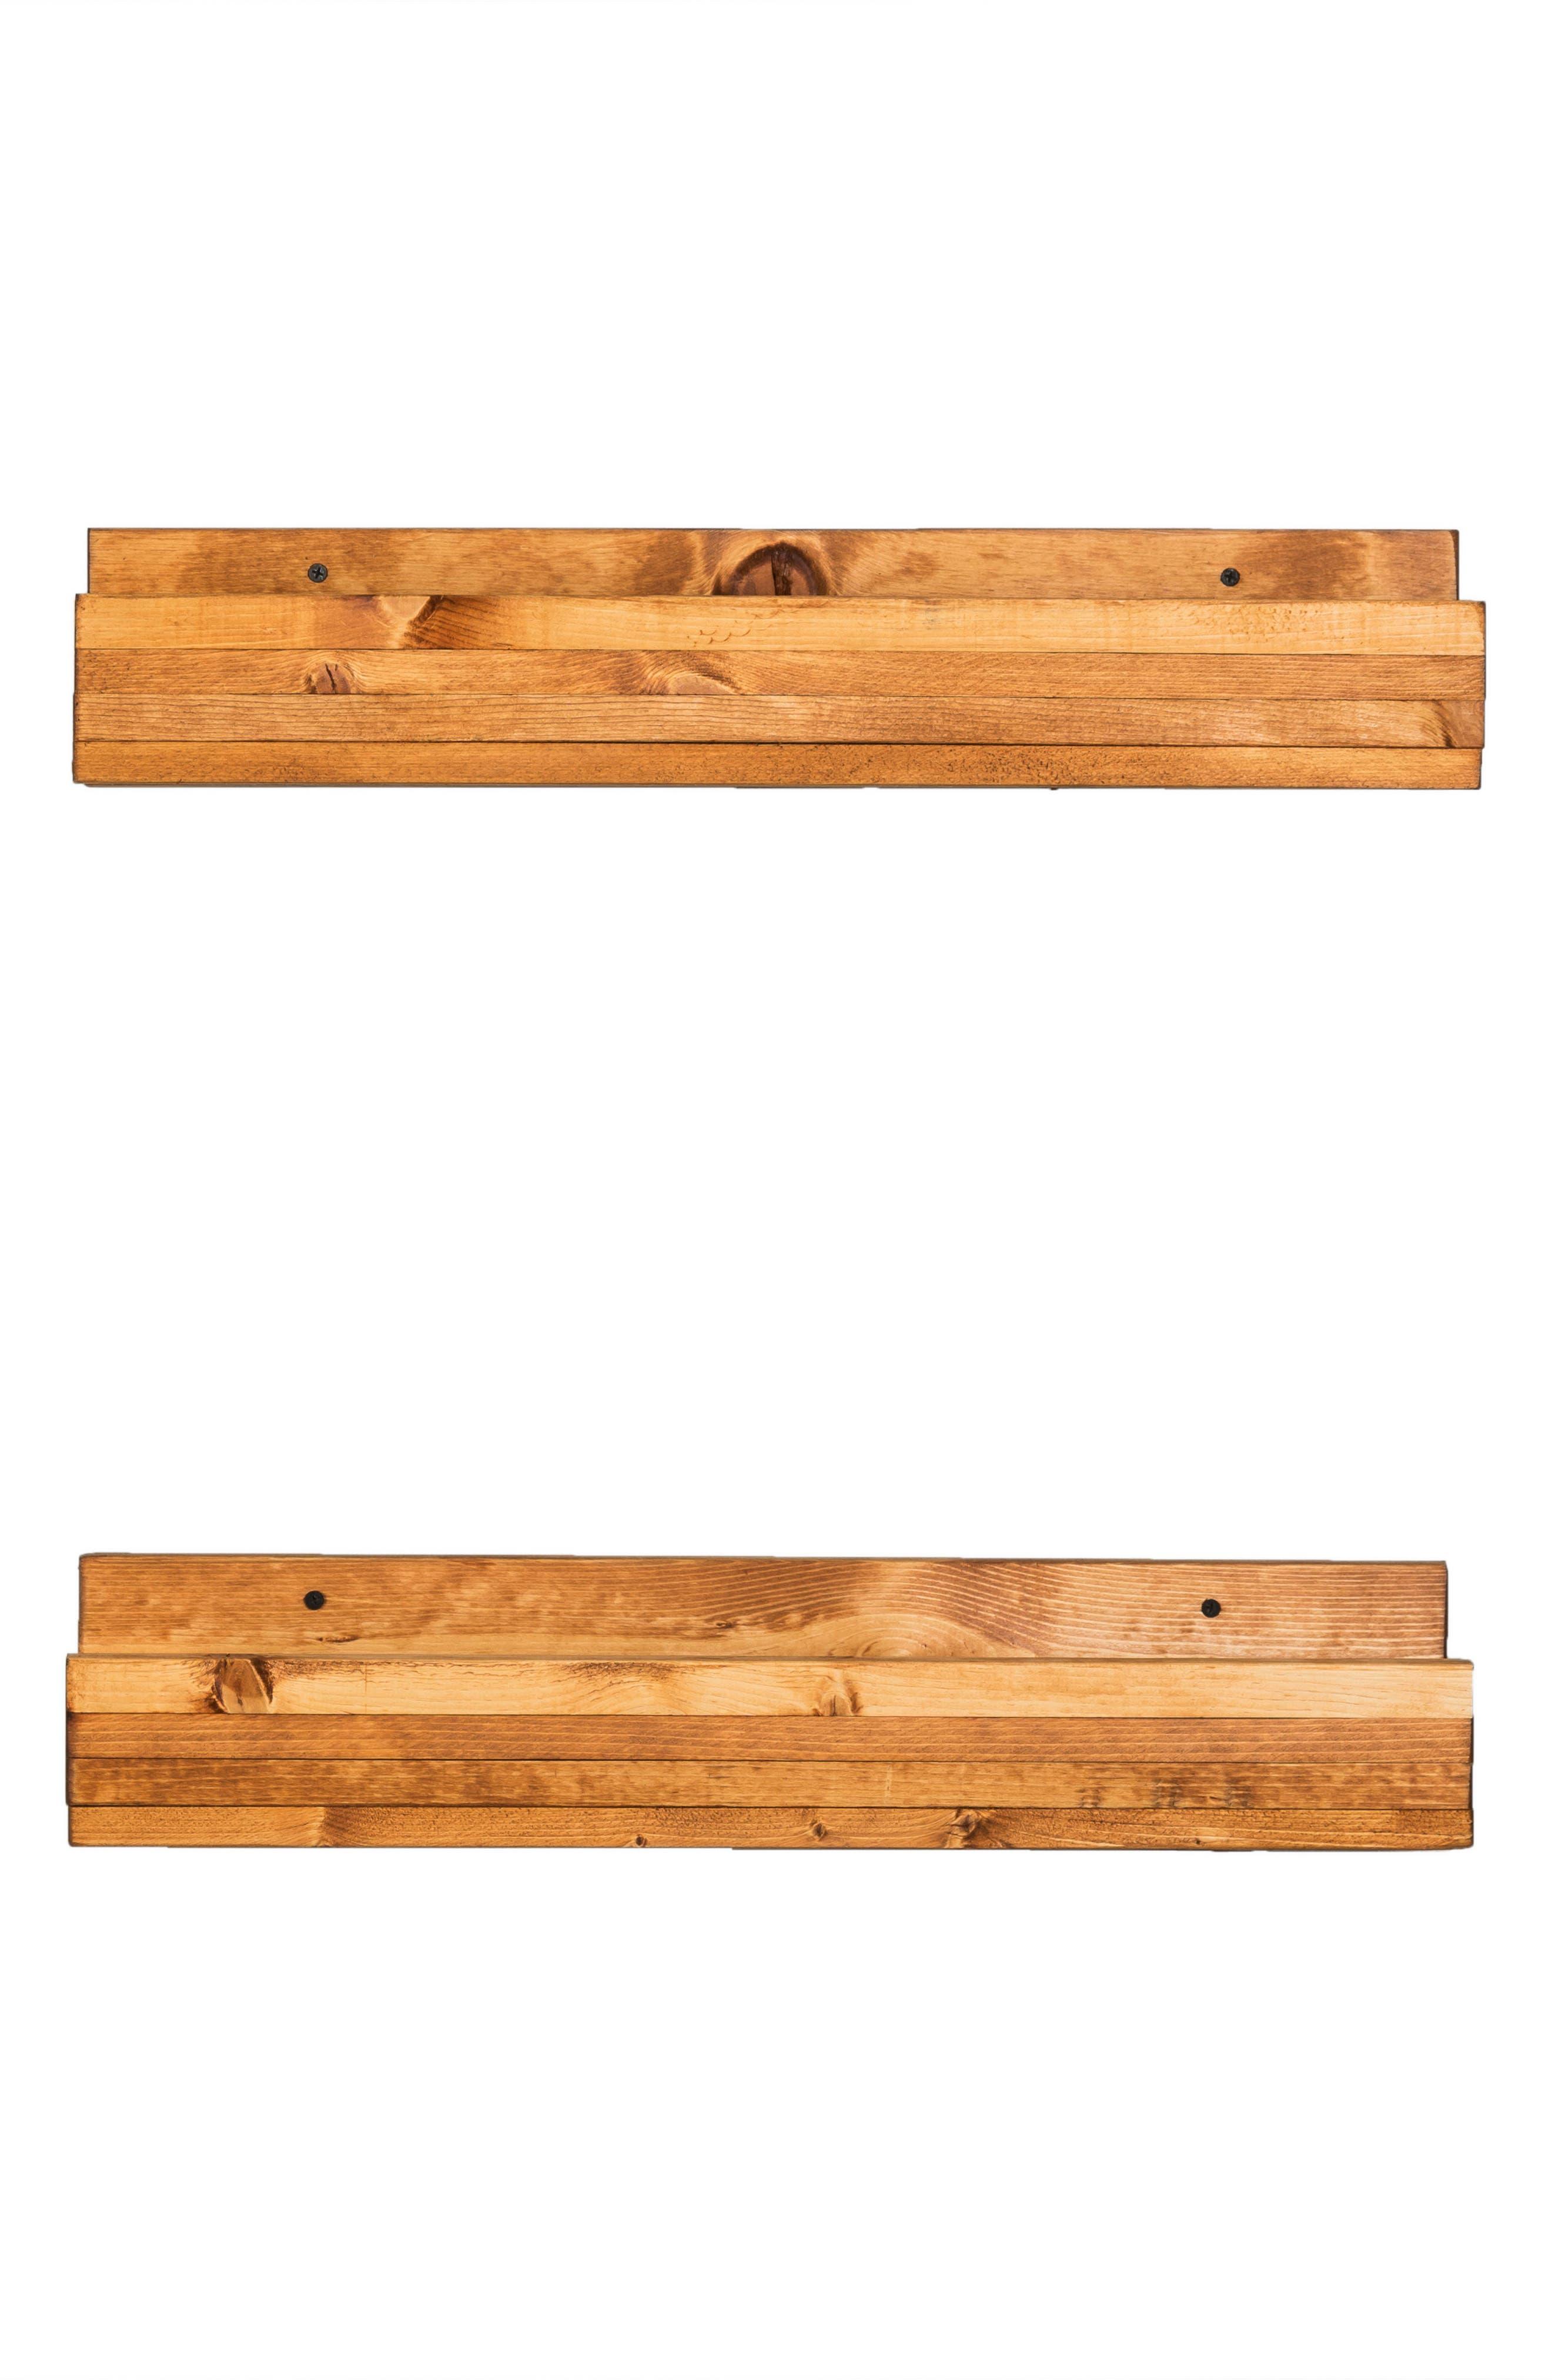 (del)Hutson Designs Set of 2 Pine Wood Wine Racks